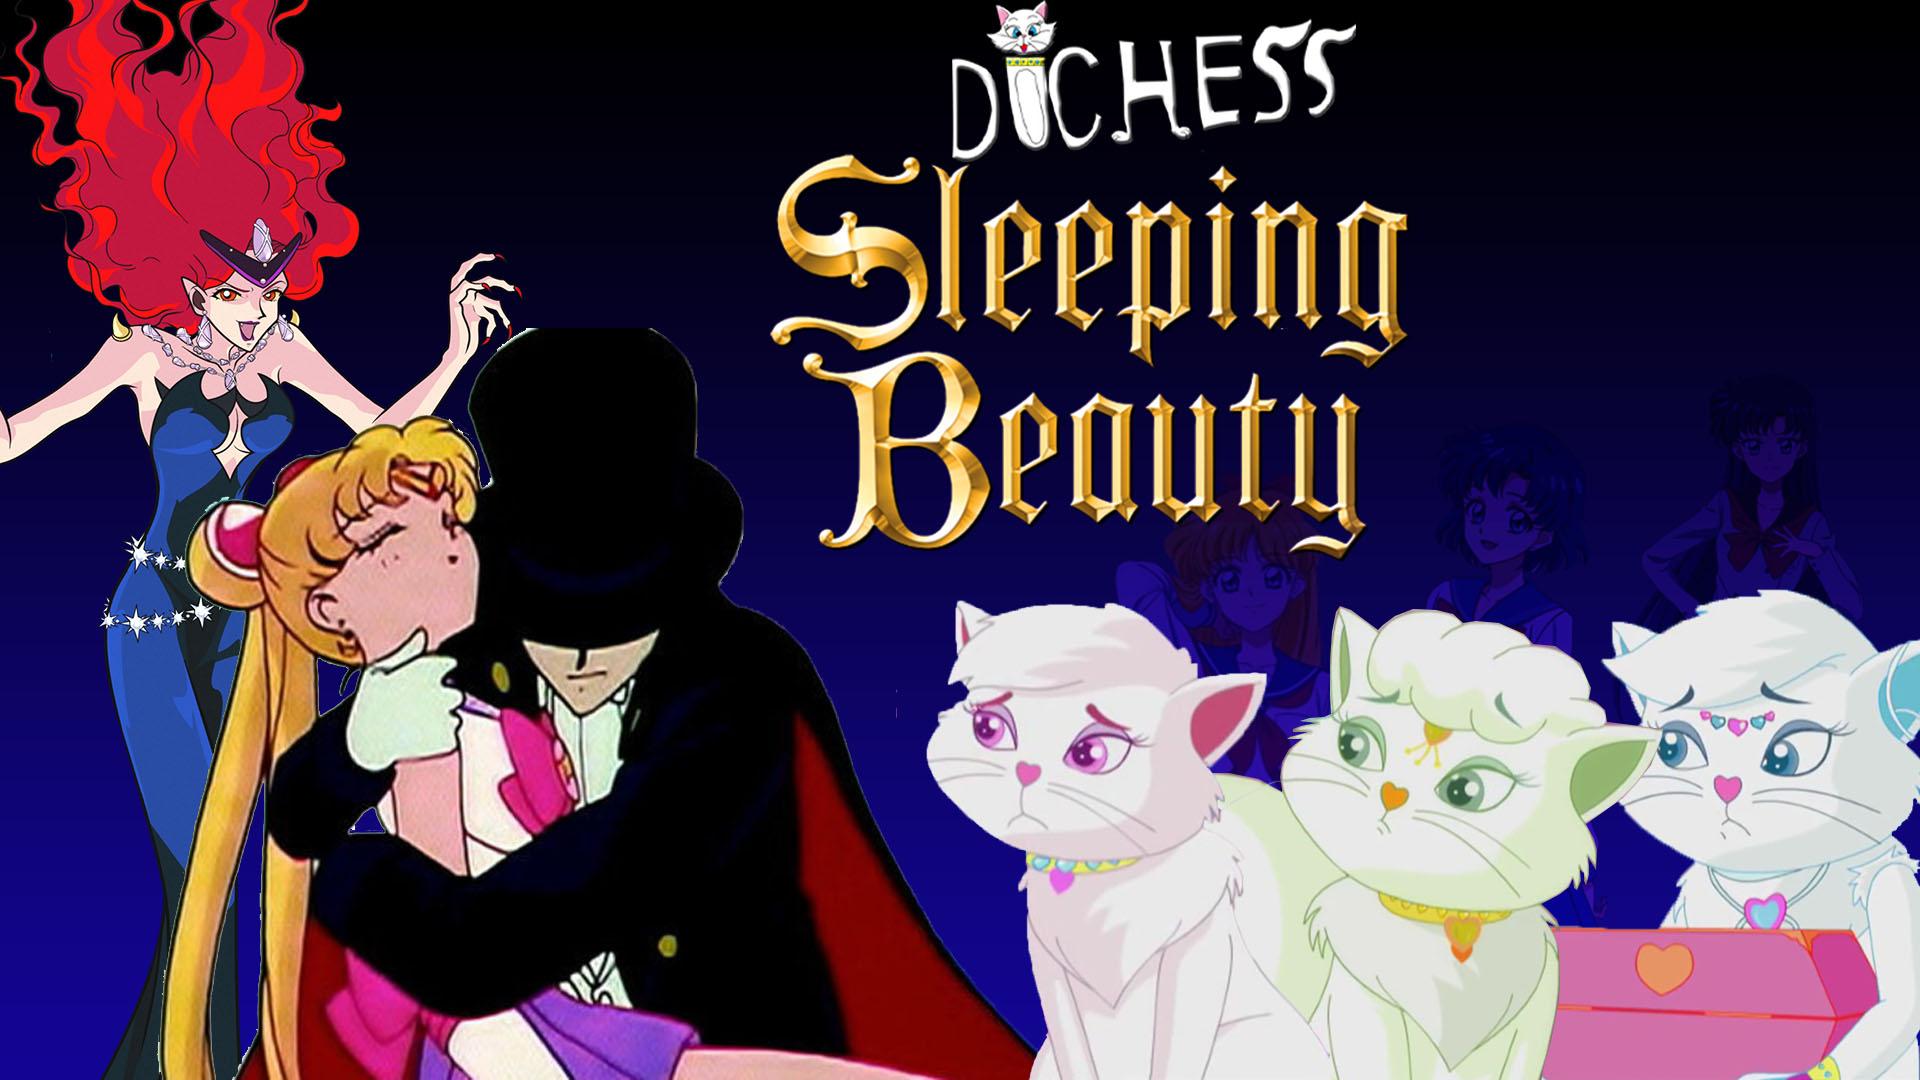 Sleeping Beauty (Duchess Style)